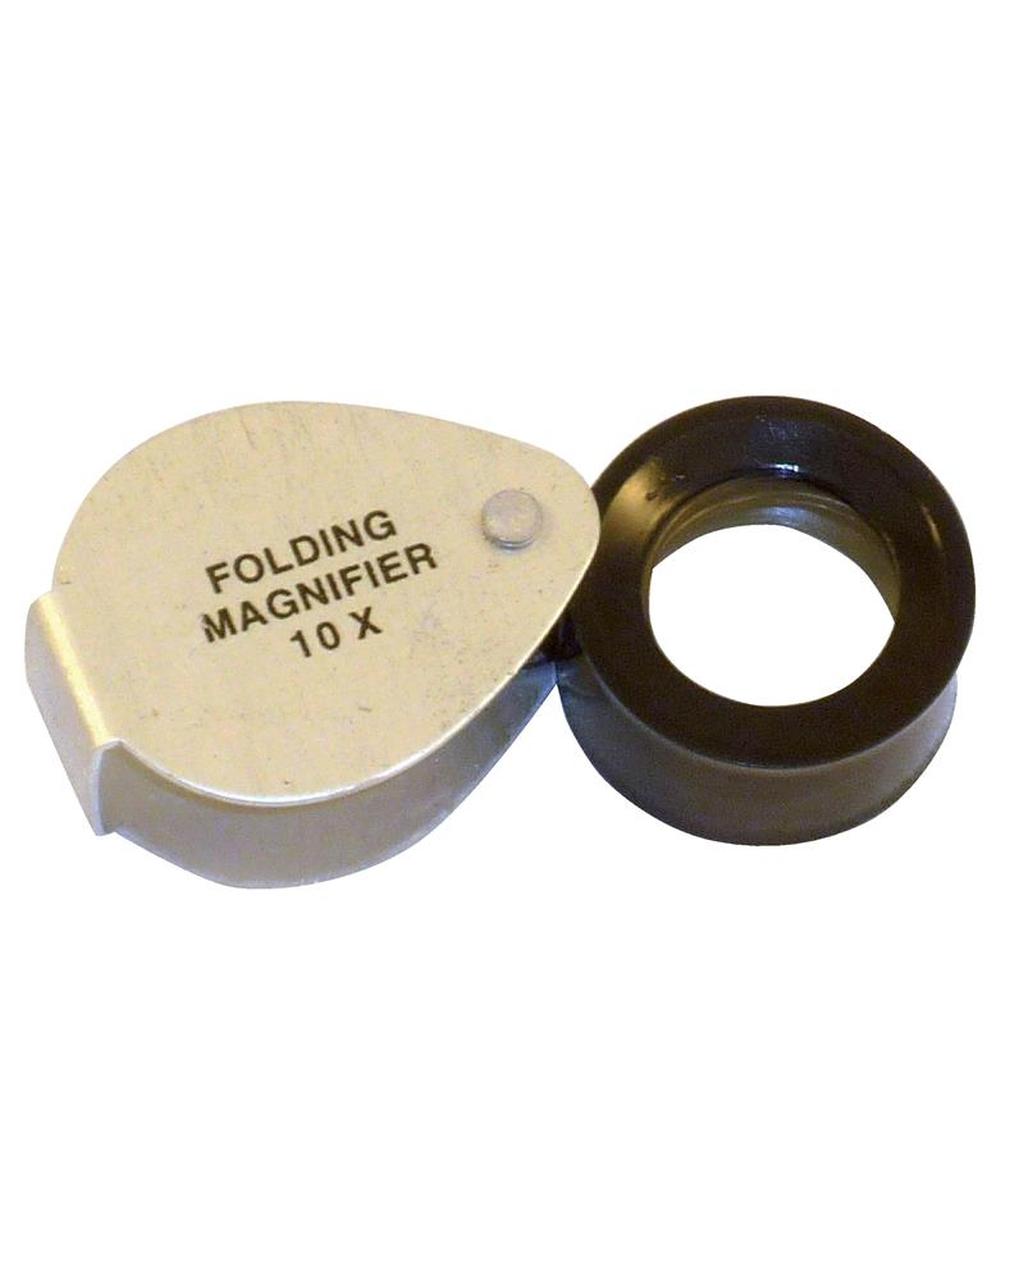 Folding Magnifier (Gowling)